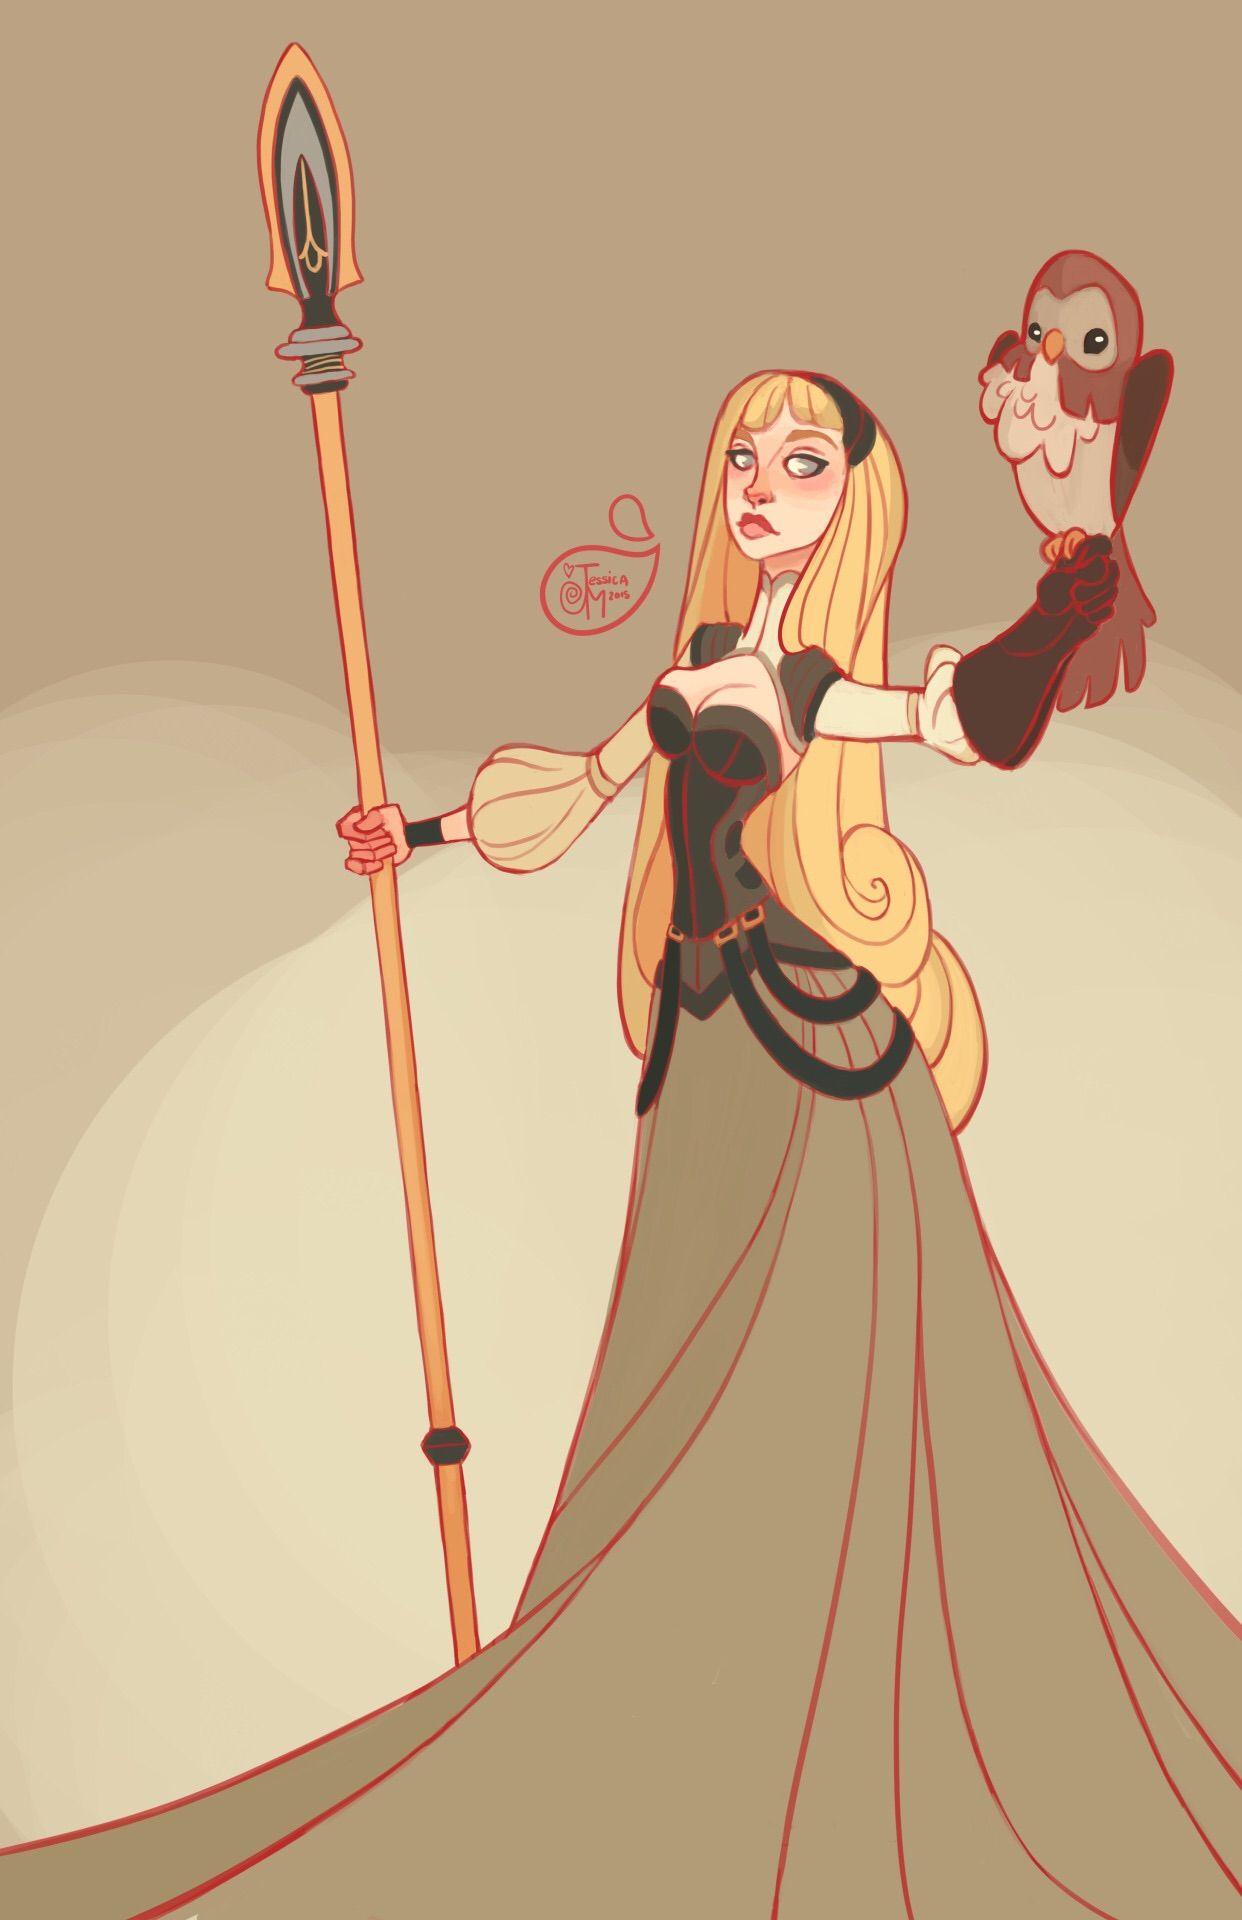 Aurora (Sleeping Beauty): Bad Ass Warrior Princesses (by Jessica Madorran)